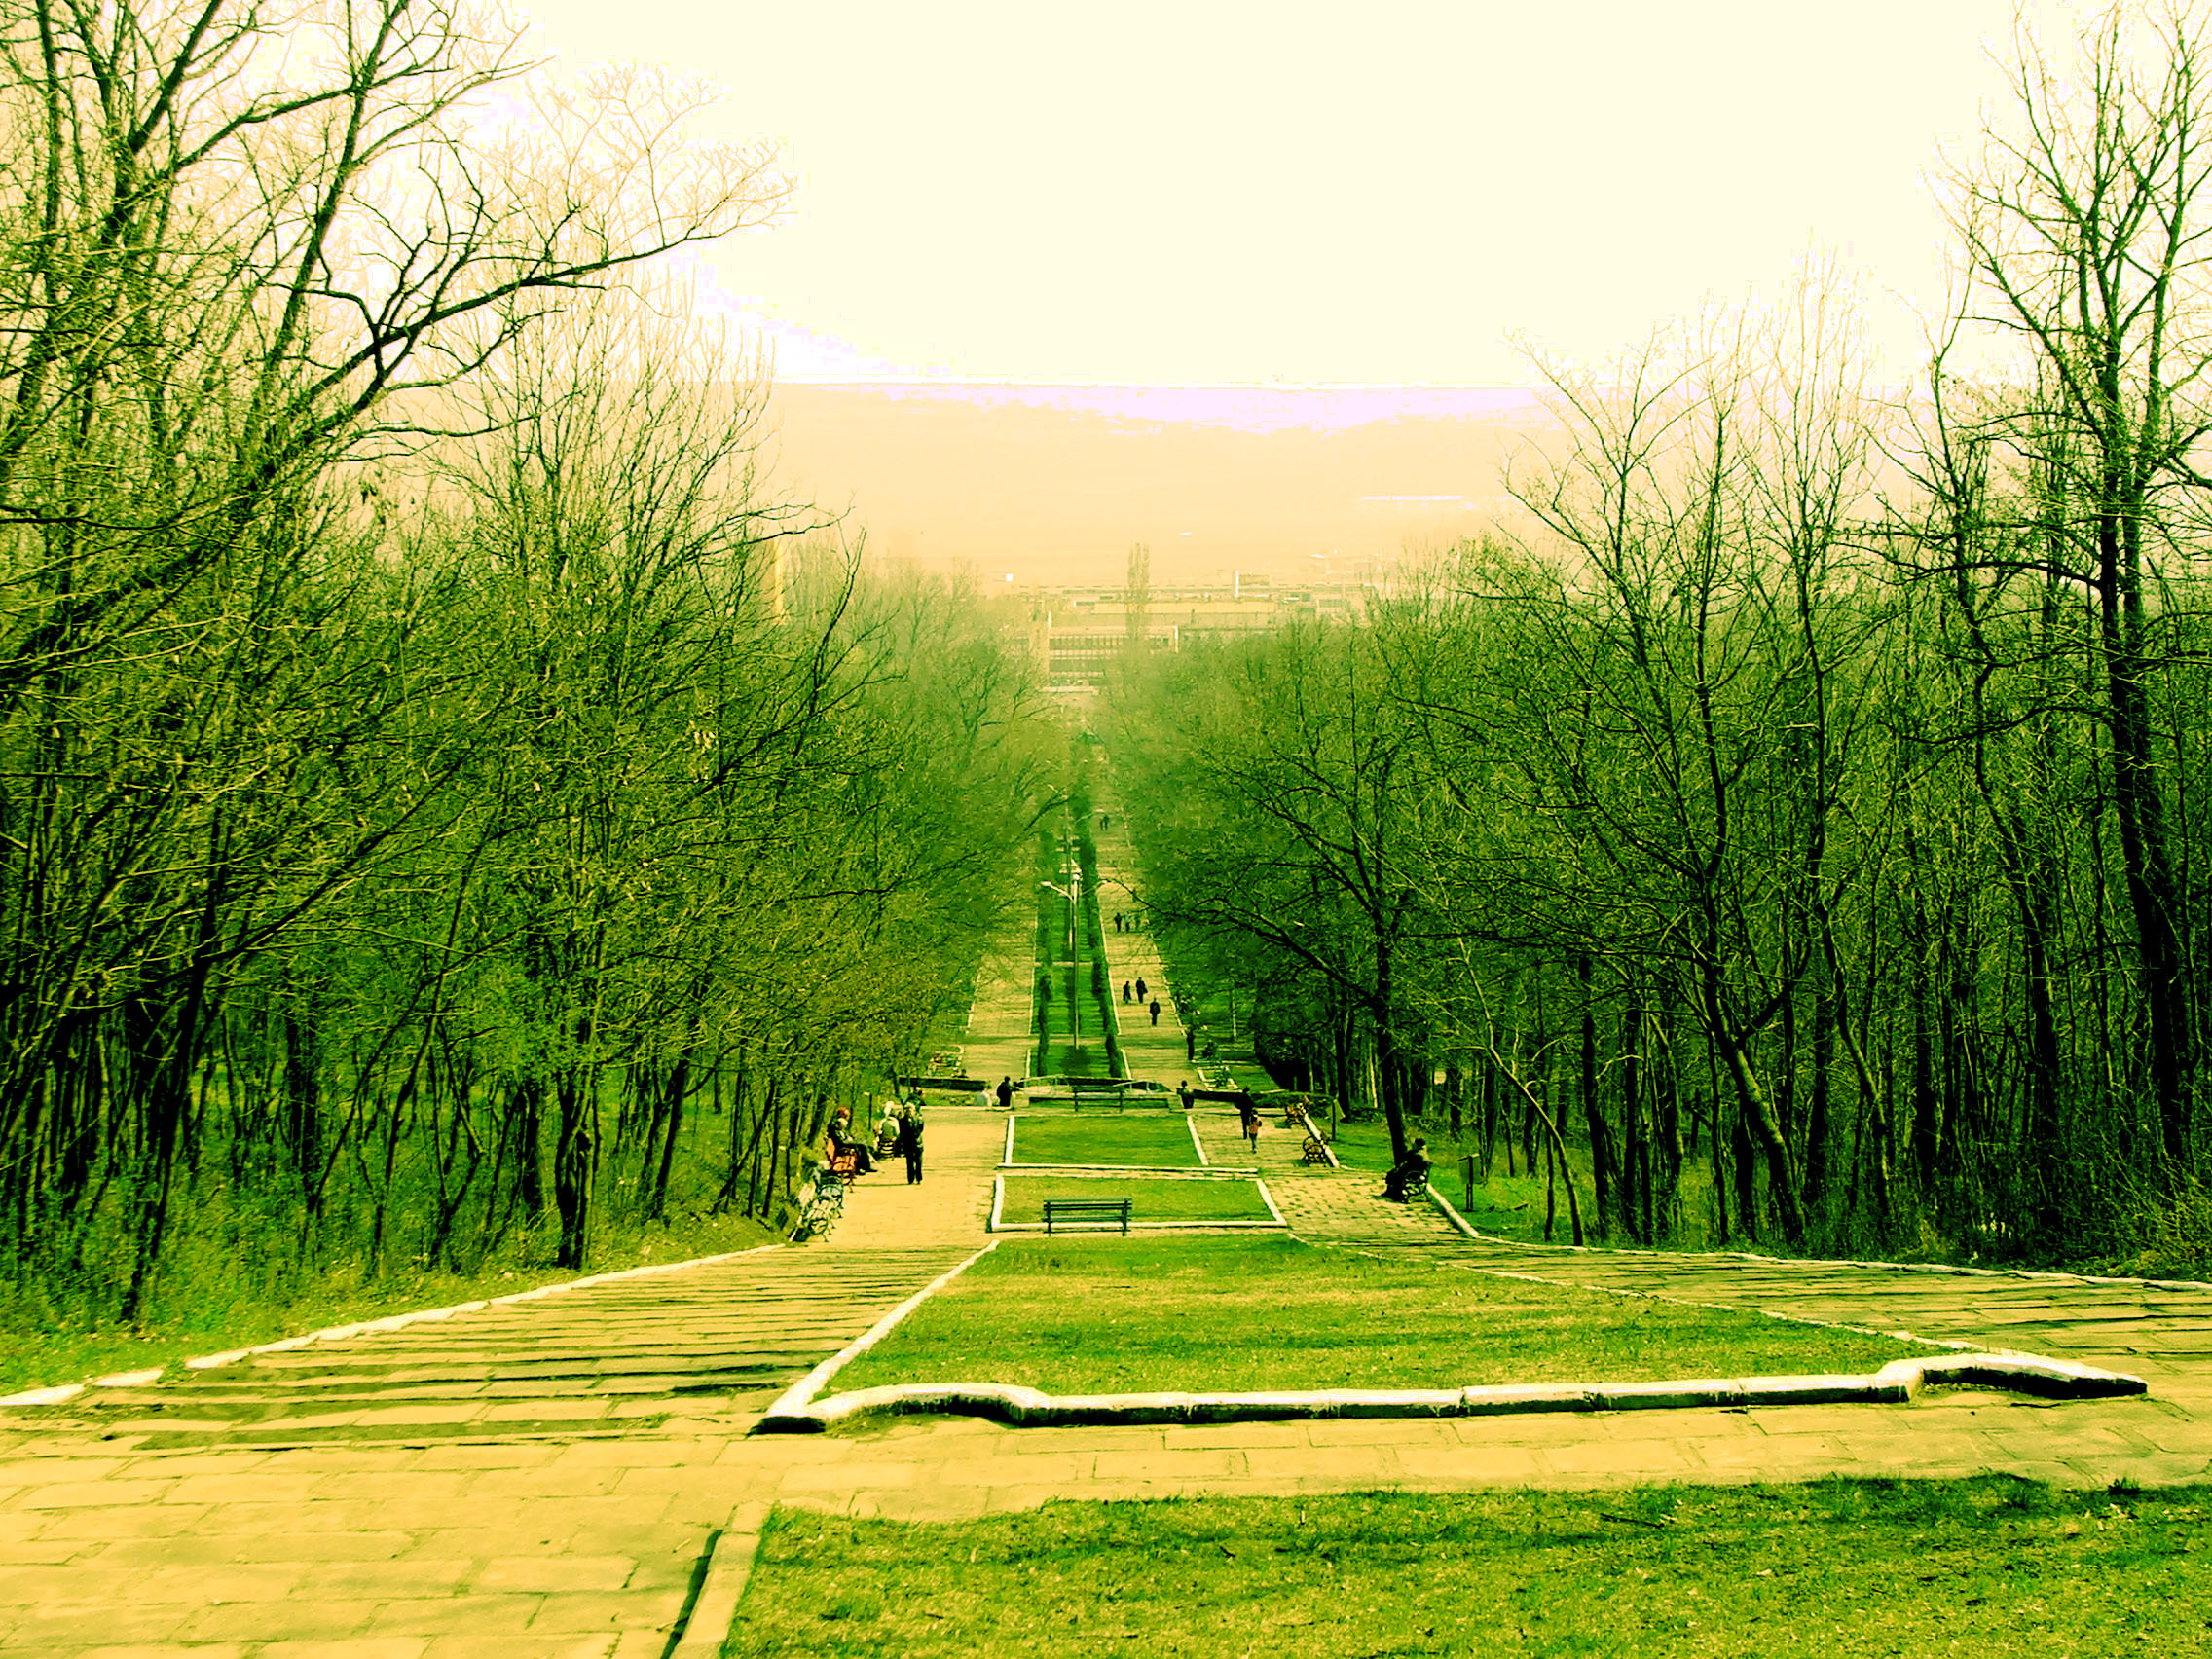 România – o fotografie şi o poveste (6)